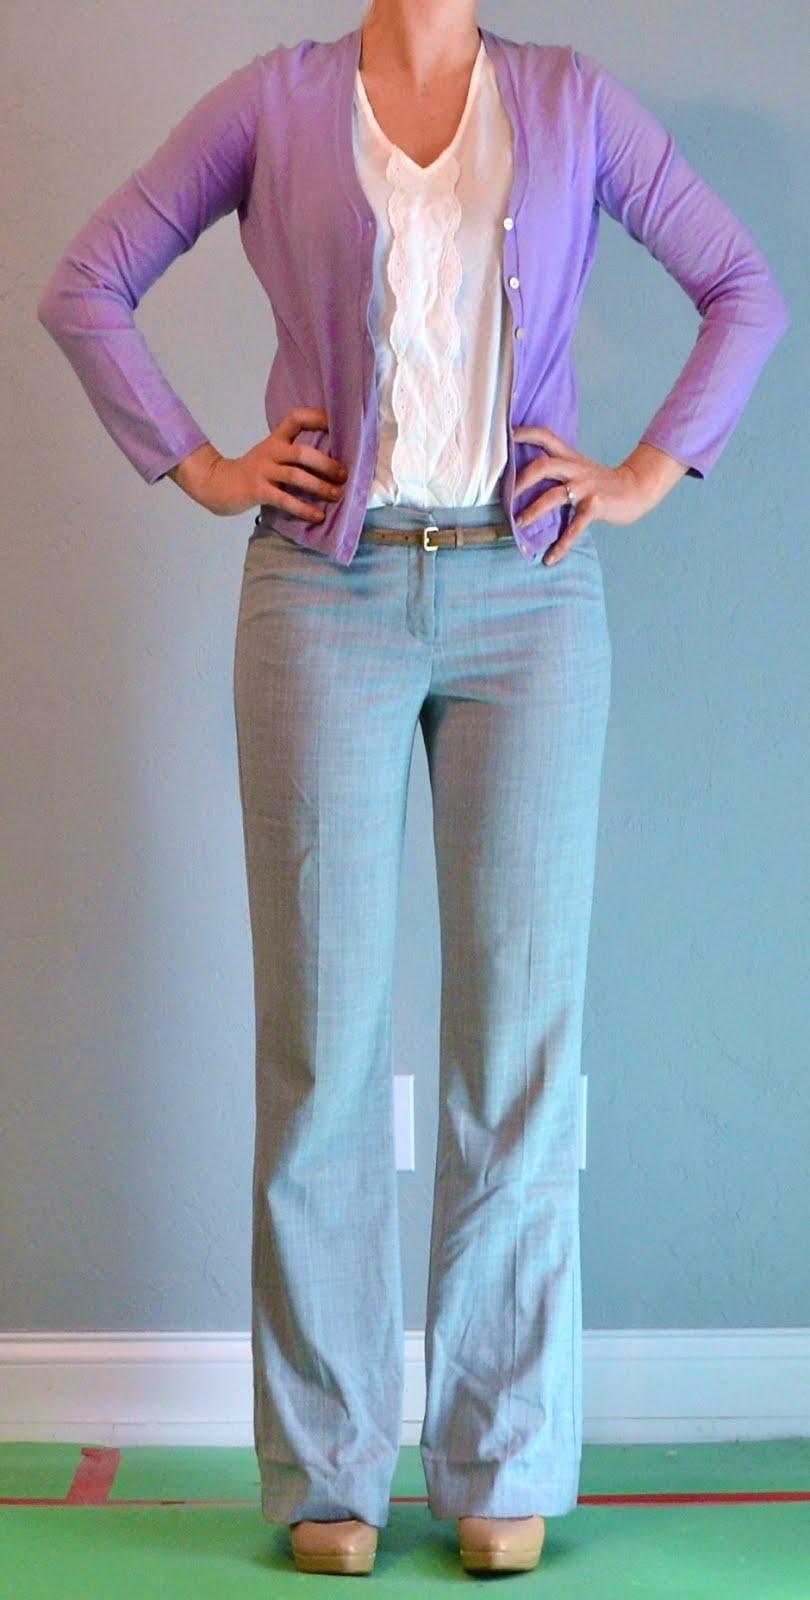 e2f32c24d941 Ruffle white shell – Old Navy Purple cardigan – Banana Republic Bottom  Grey  work pants – Express Shoes  Nude Pumps – Aldo Accessories